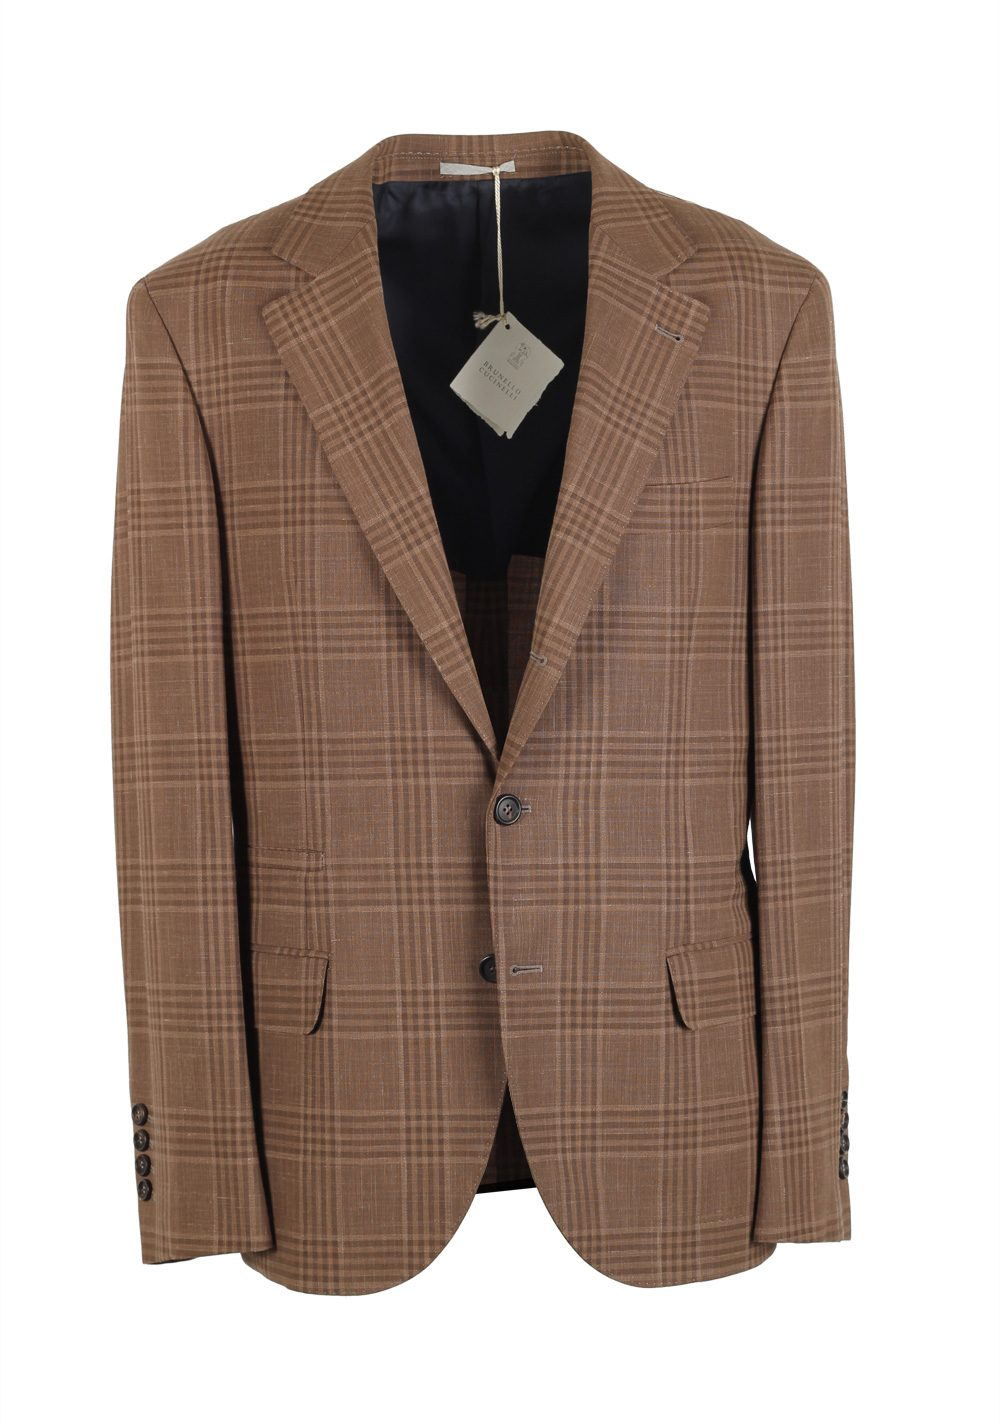 Cucinelli Beige Sport Coat Size 48 / 38R U.S. Wool Linen | Costume Limité